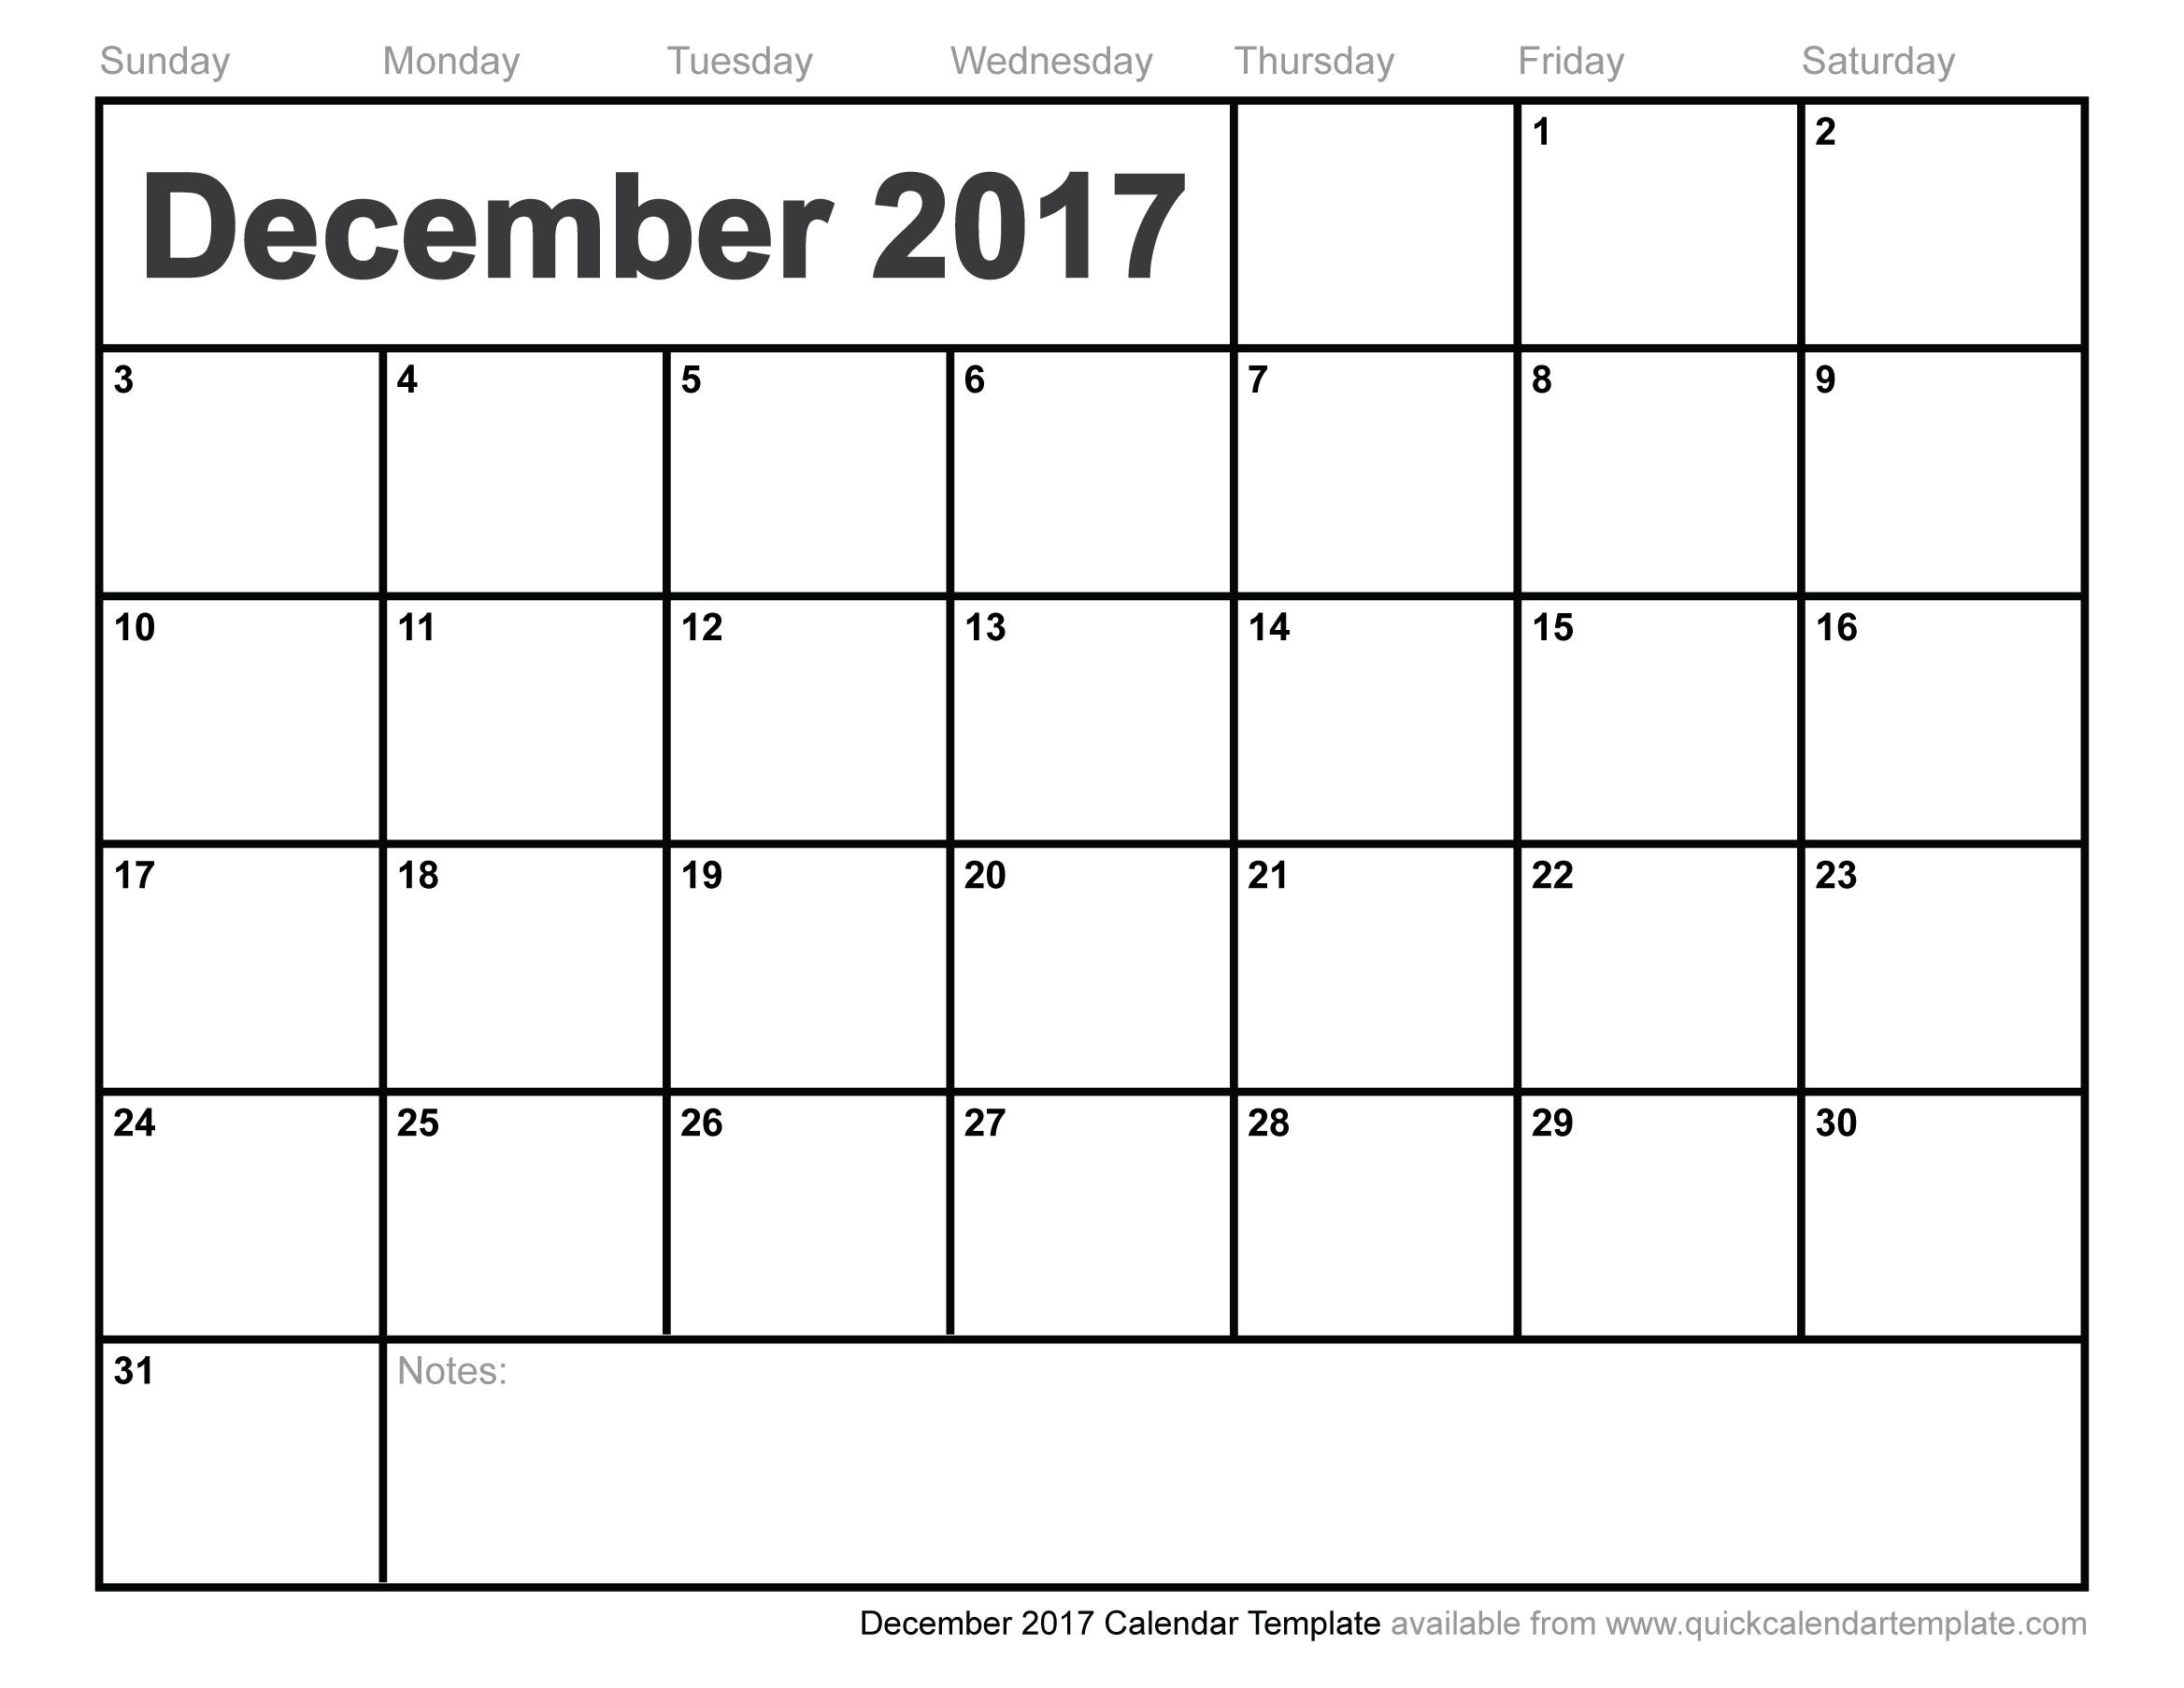 December 2017 Calendar Printable | monthly calendar printable